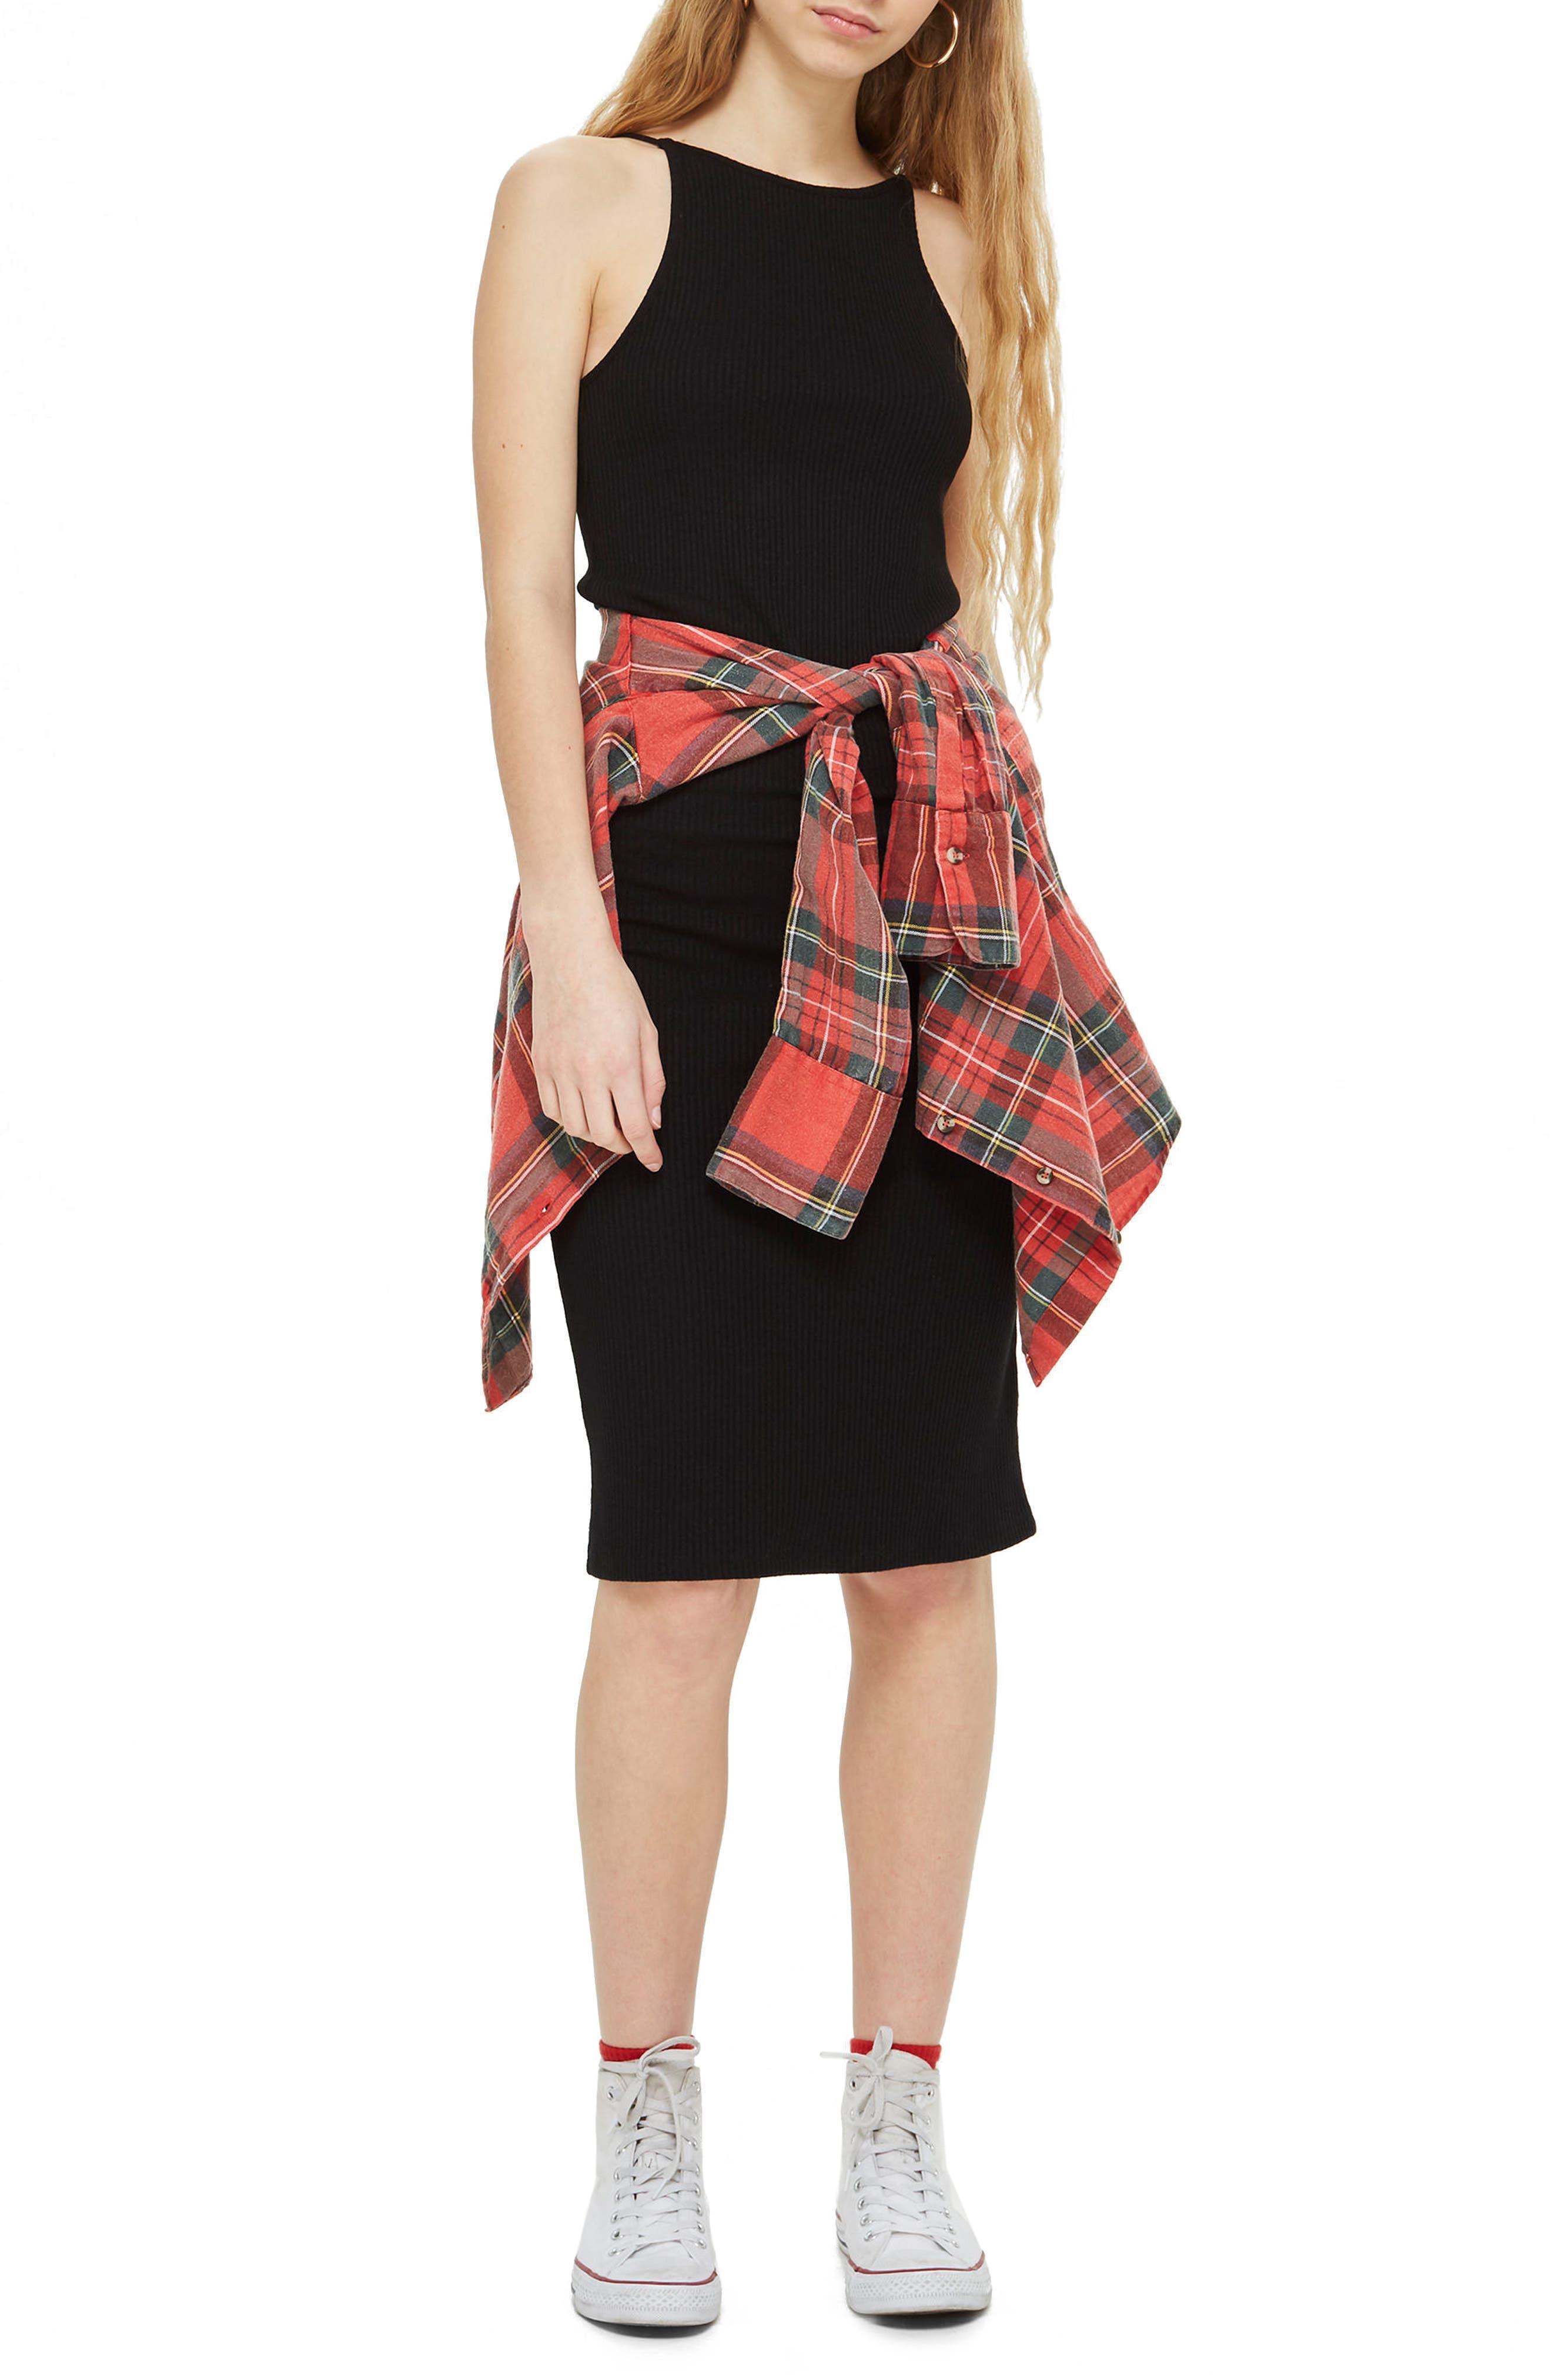 Topshop Scoop Back Ribbed Midi Dress